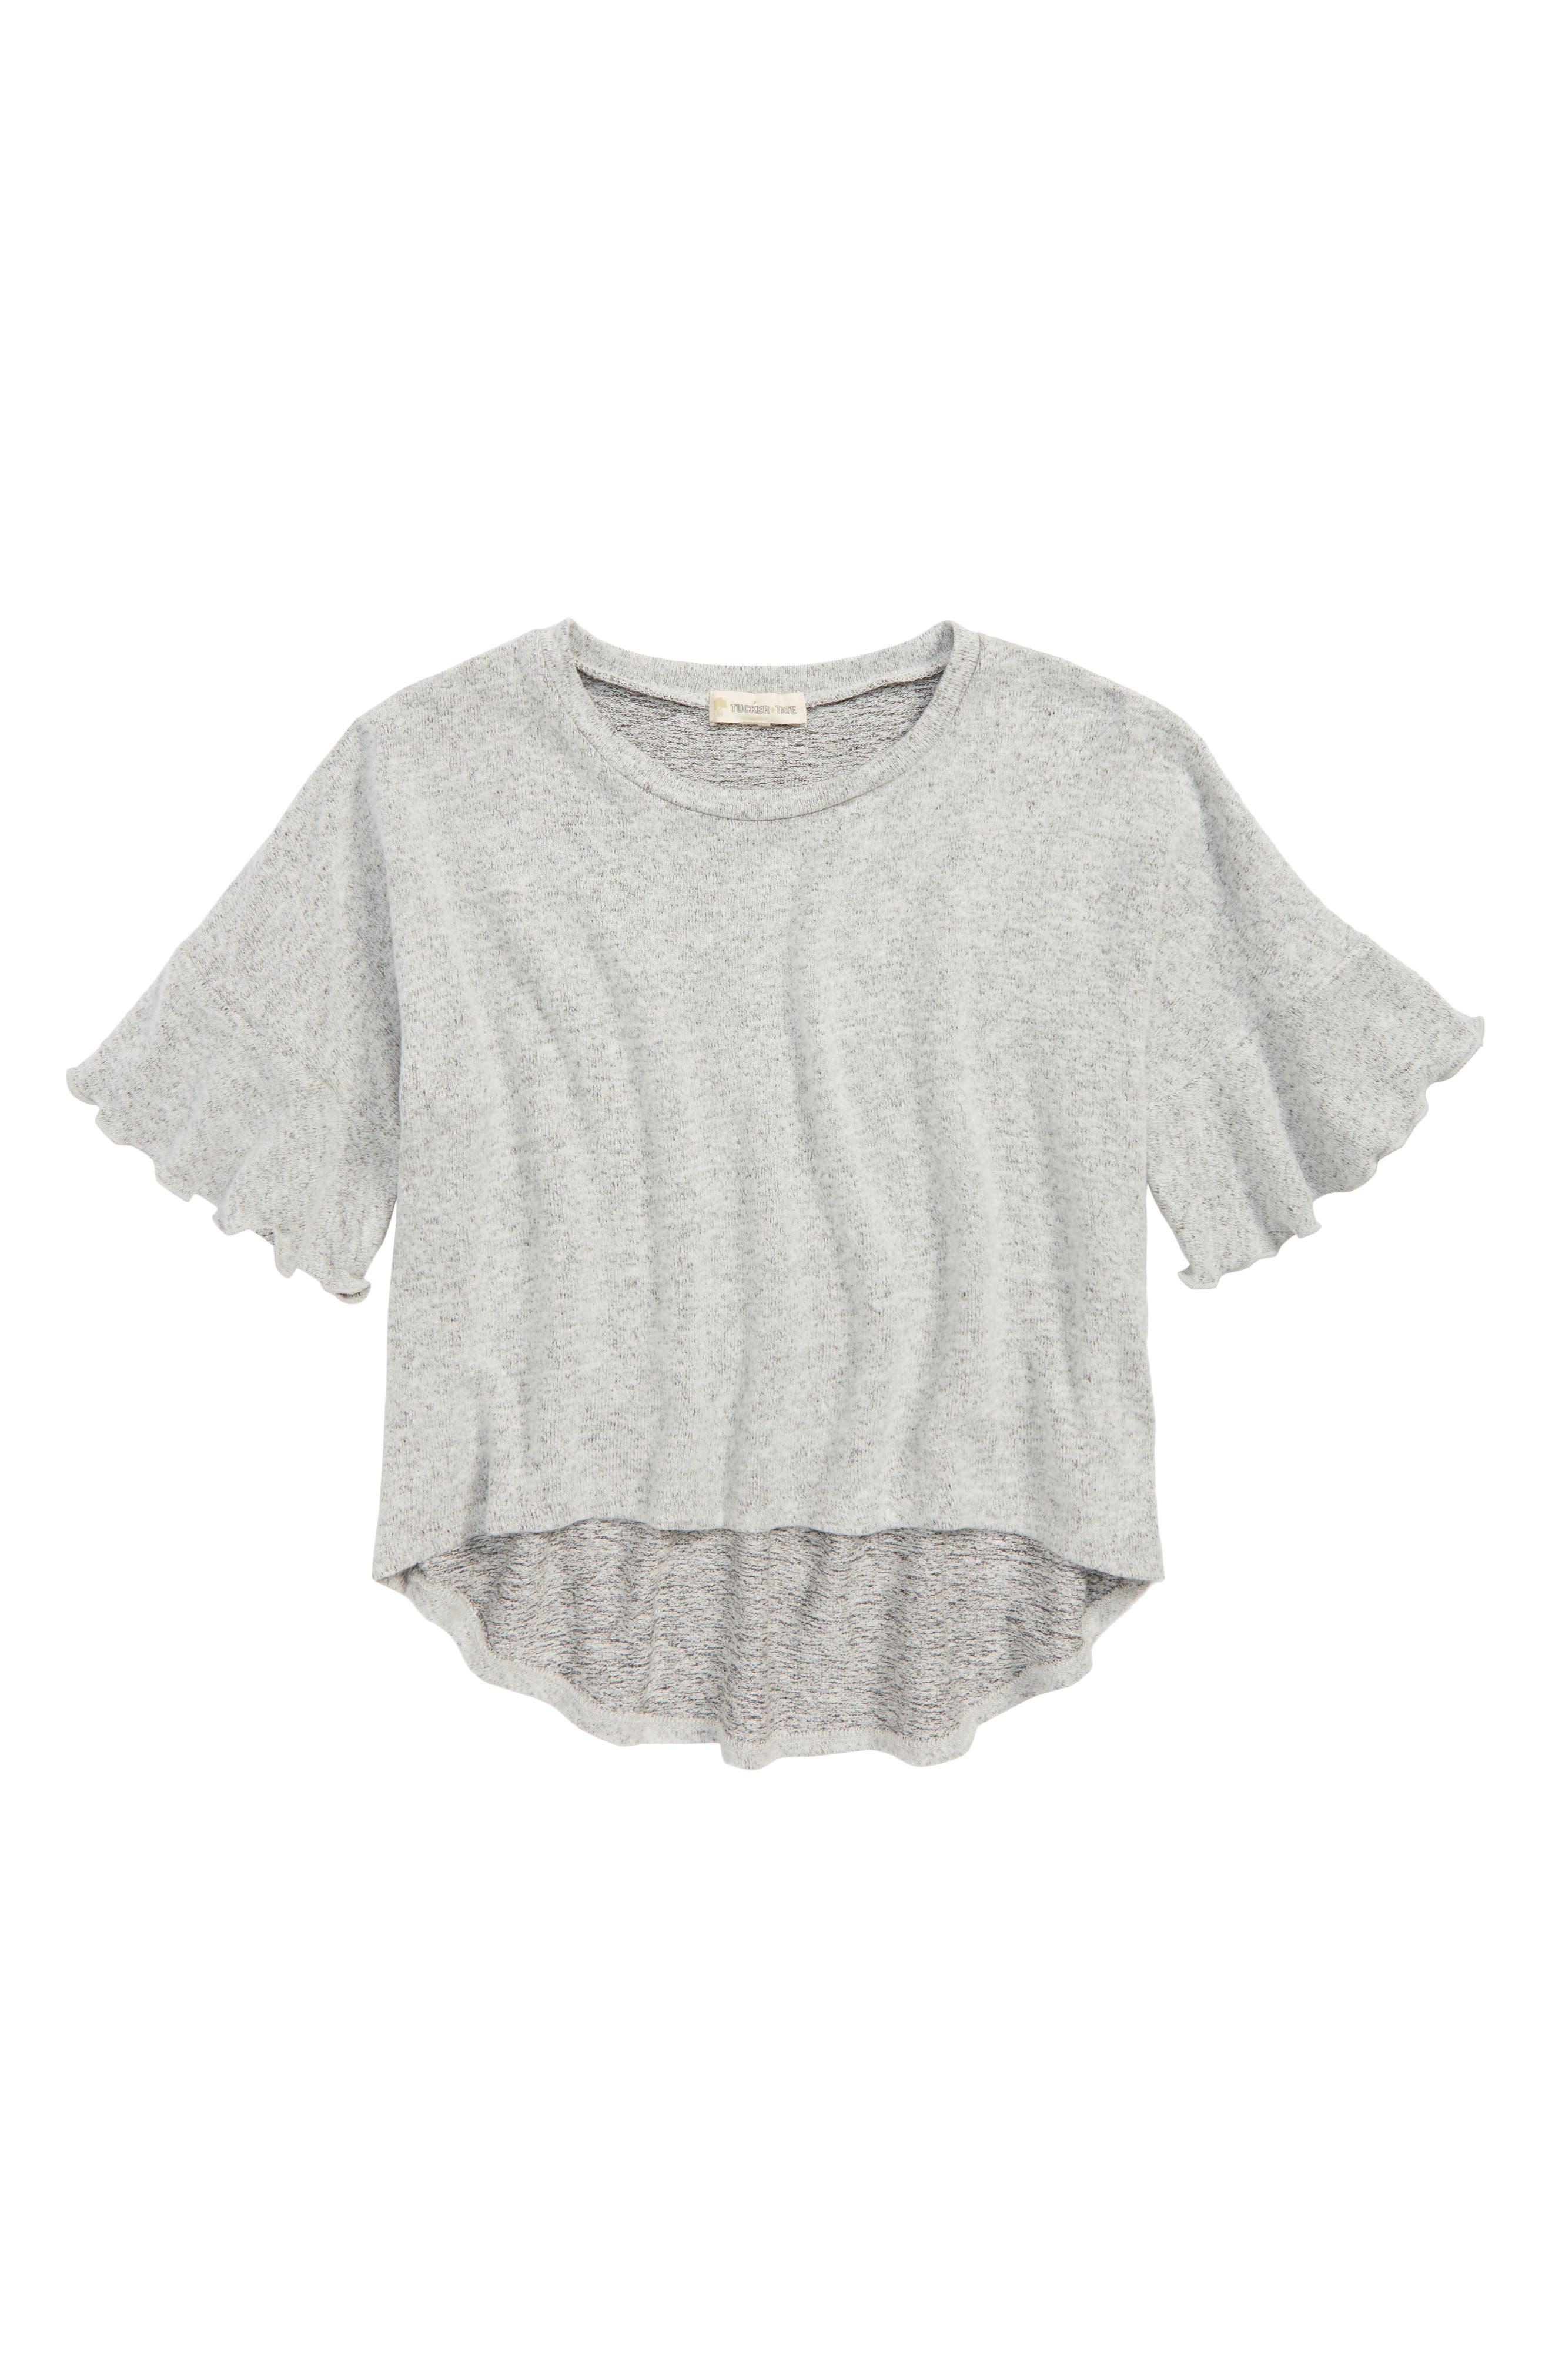 Ruffle Sleeve Knit Top,                             Main thumbnail 1, color,                             030